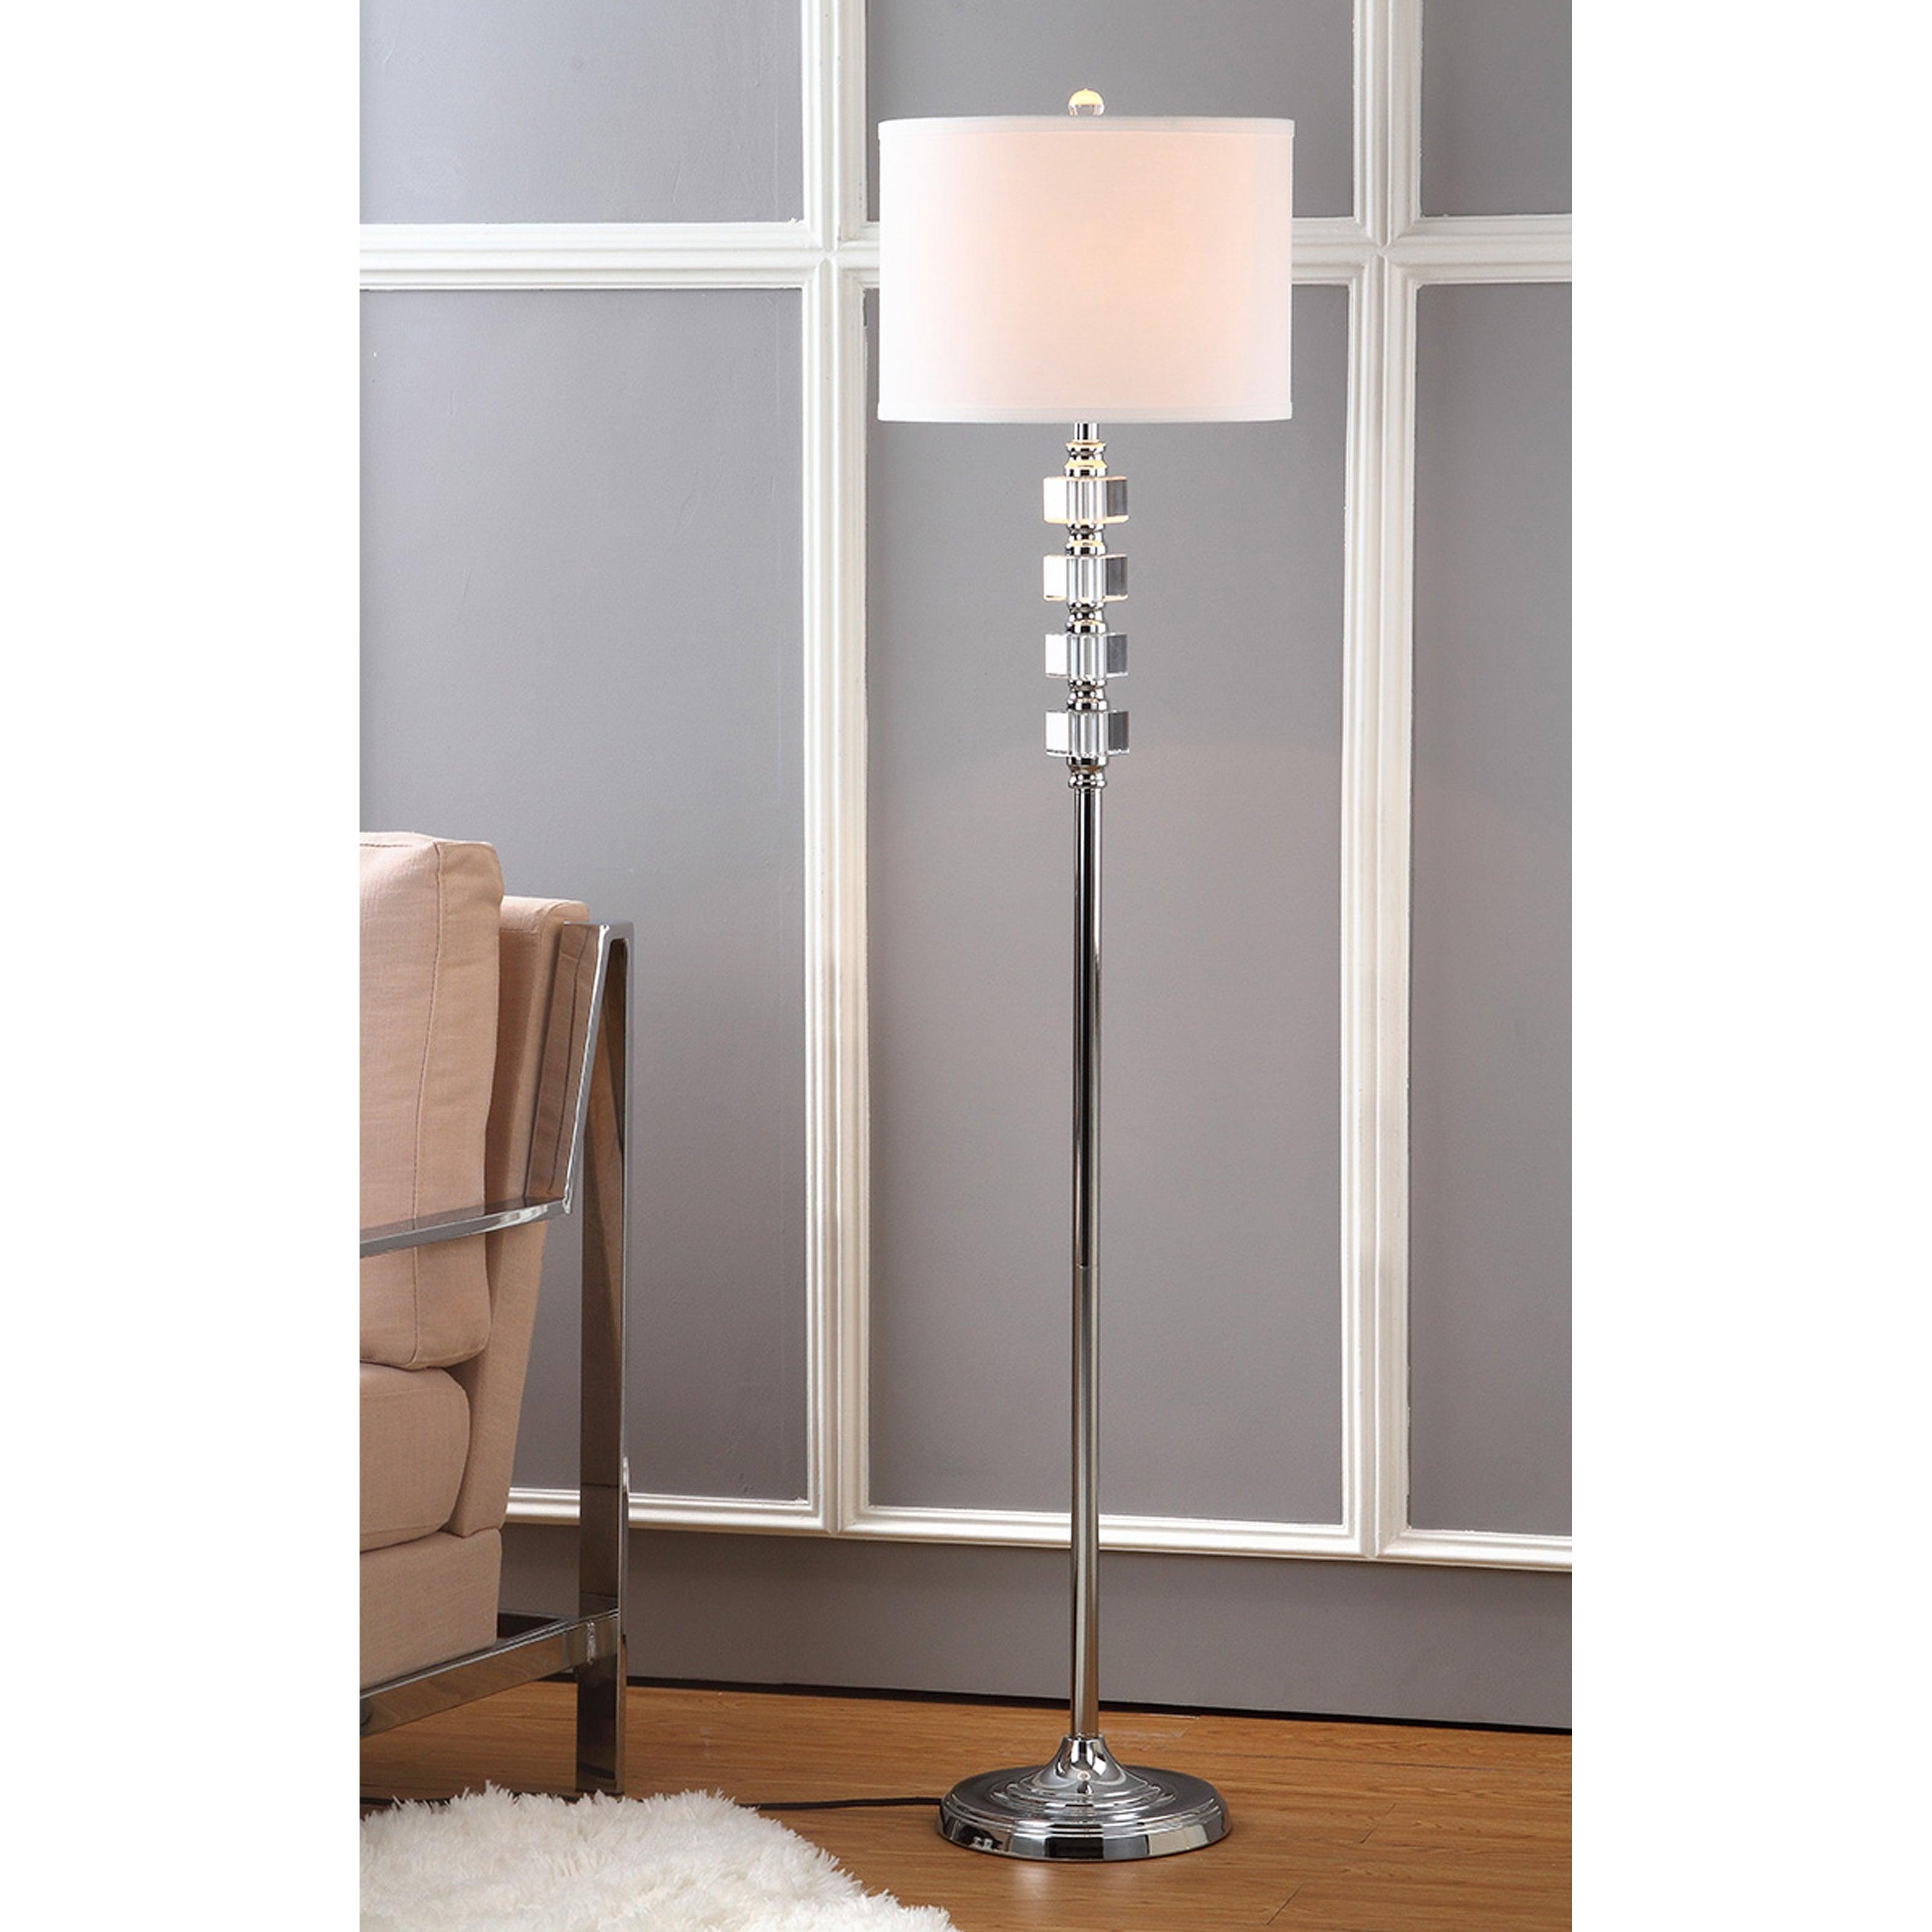 Safavieh Lighting 60 Inch Crystal Lombard Street Floor Lamp 14 X14 X60 On Sale Overstock 9043344